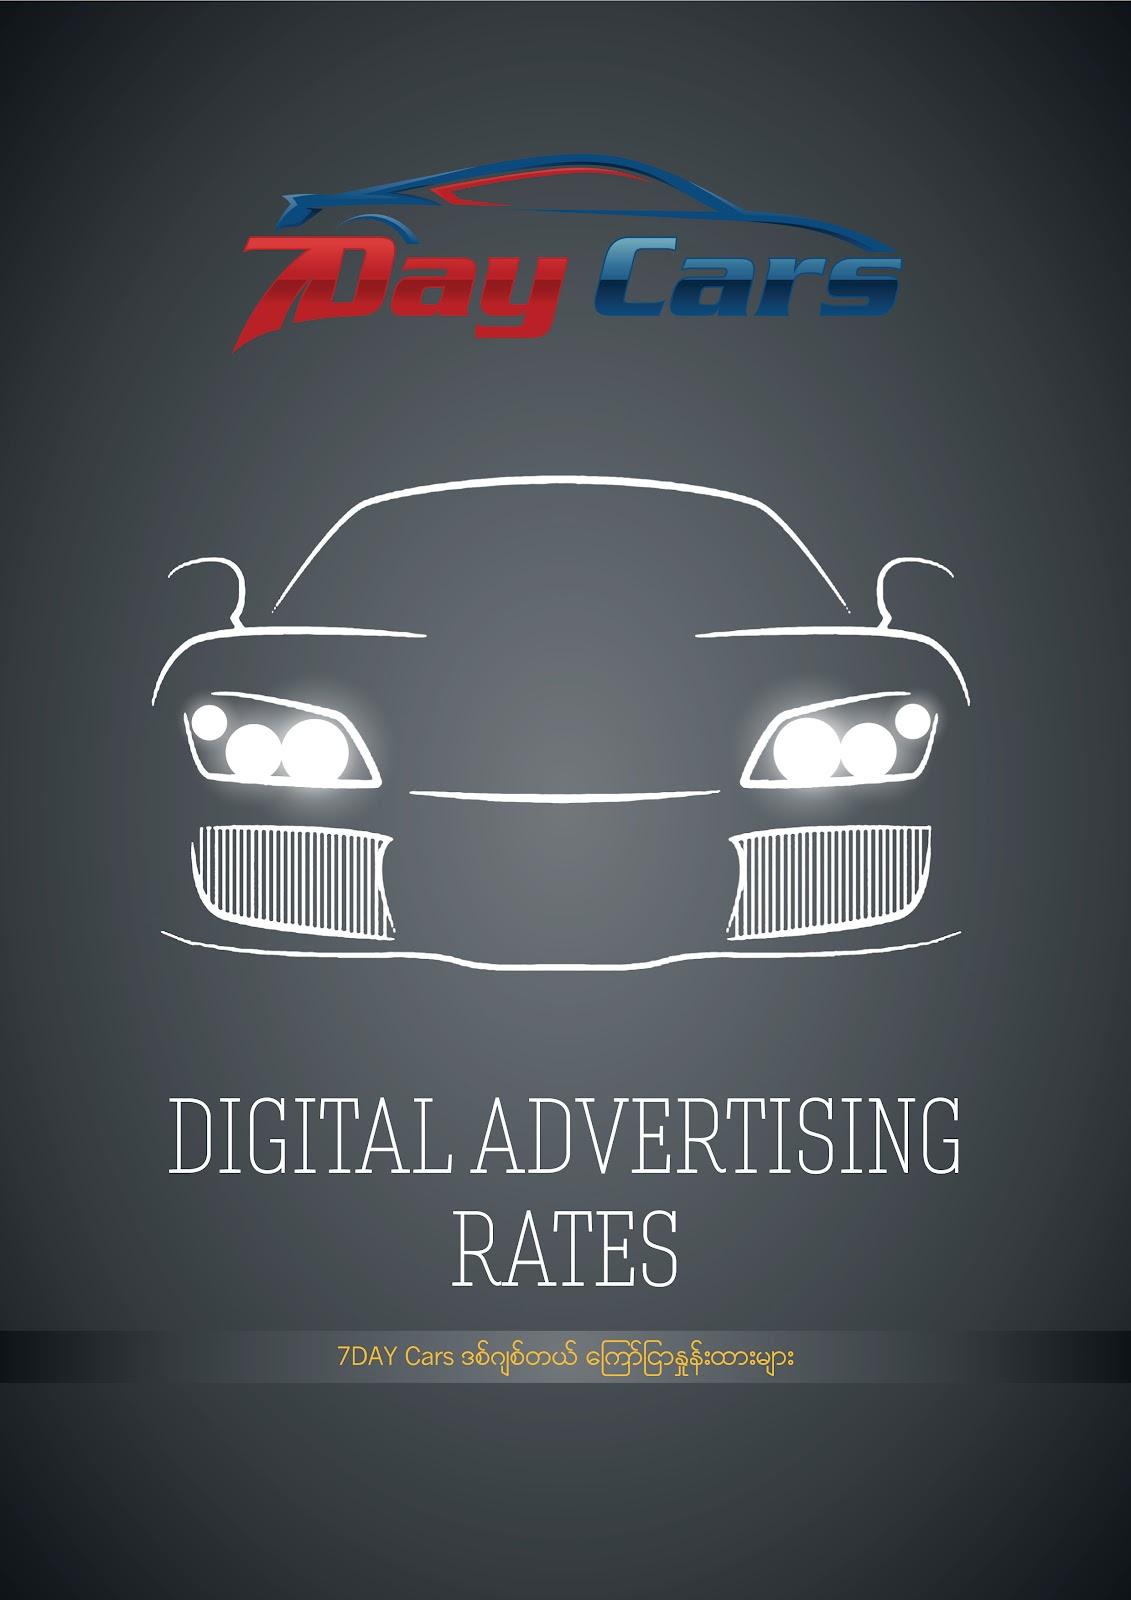 7DayCars-Ads-ratesheet-1.jpg